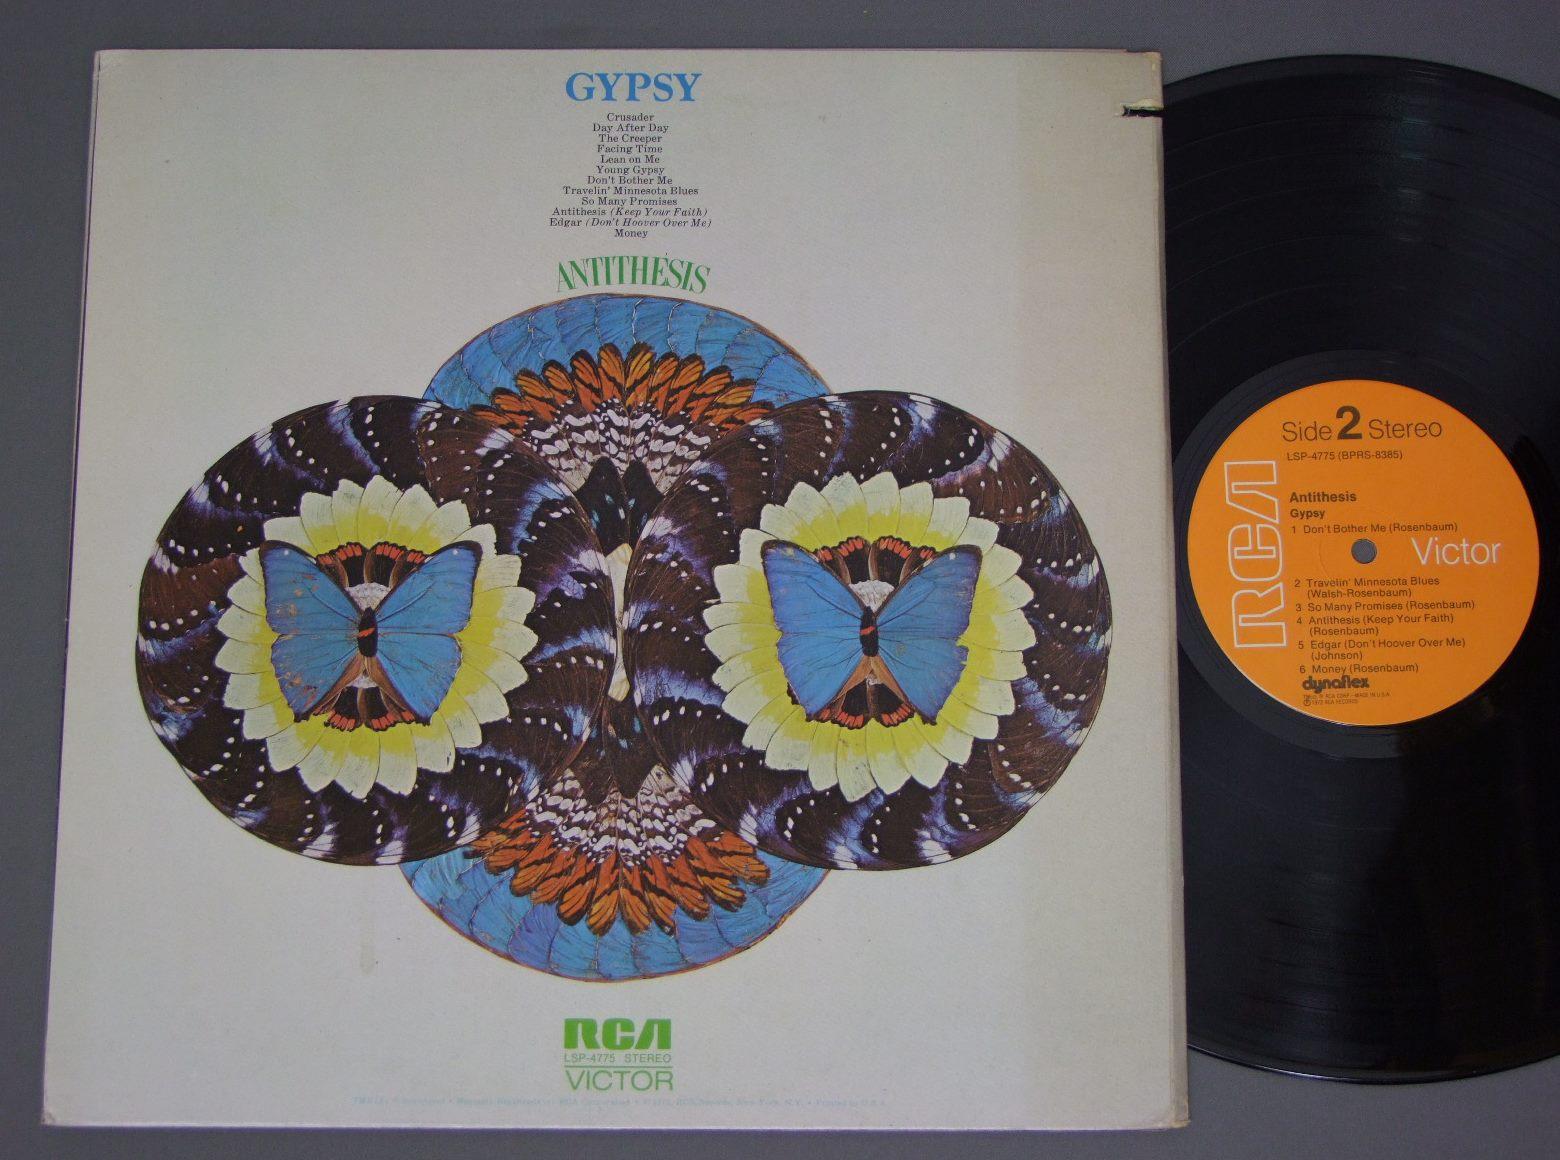 gypsy antithesis album Antithesis (keep your faith) faithmp3(734kb) edgar money this was gypsy's third album - their first on rca records - released in 1972.